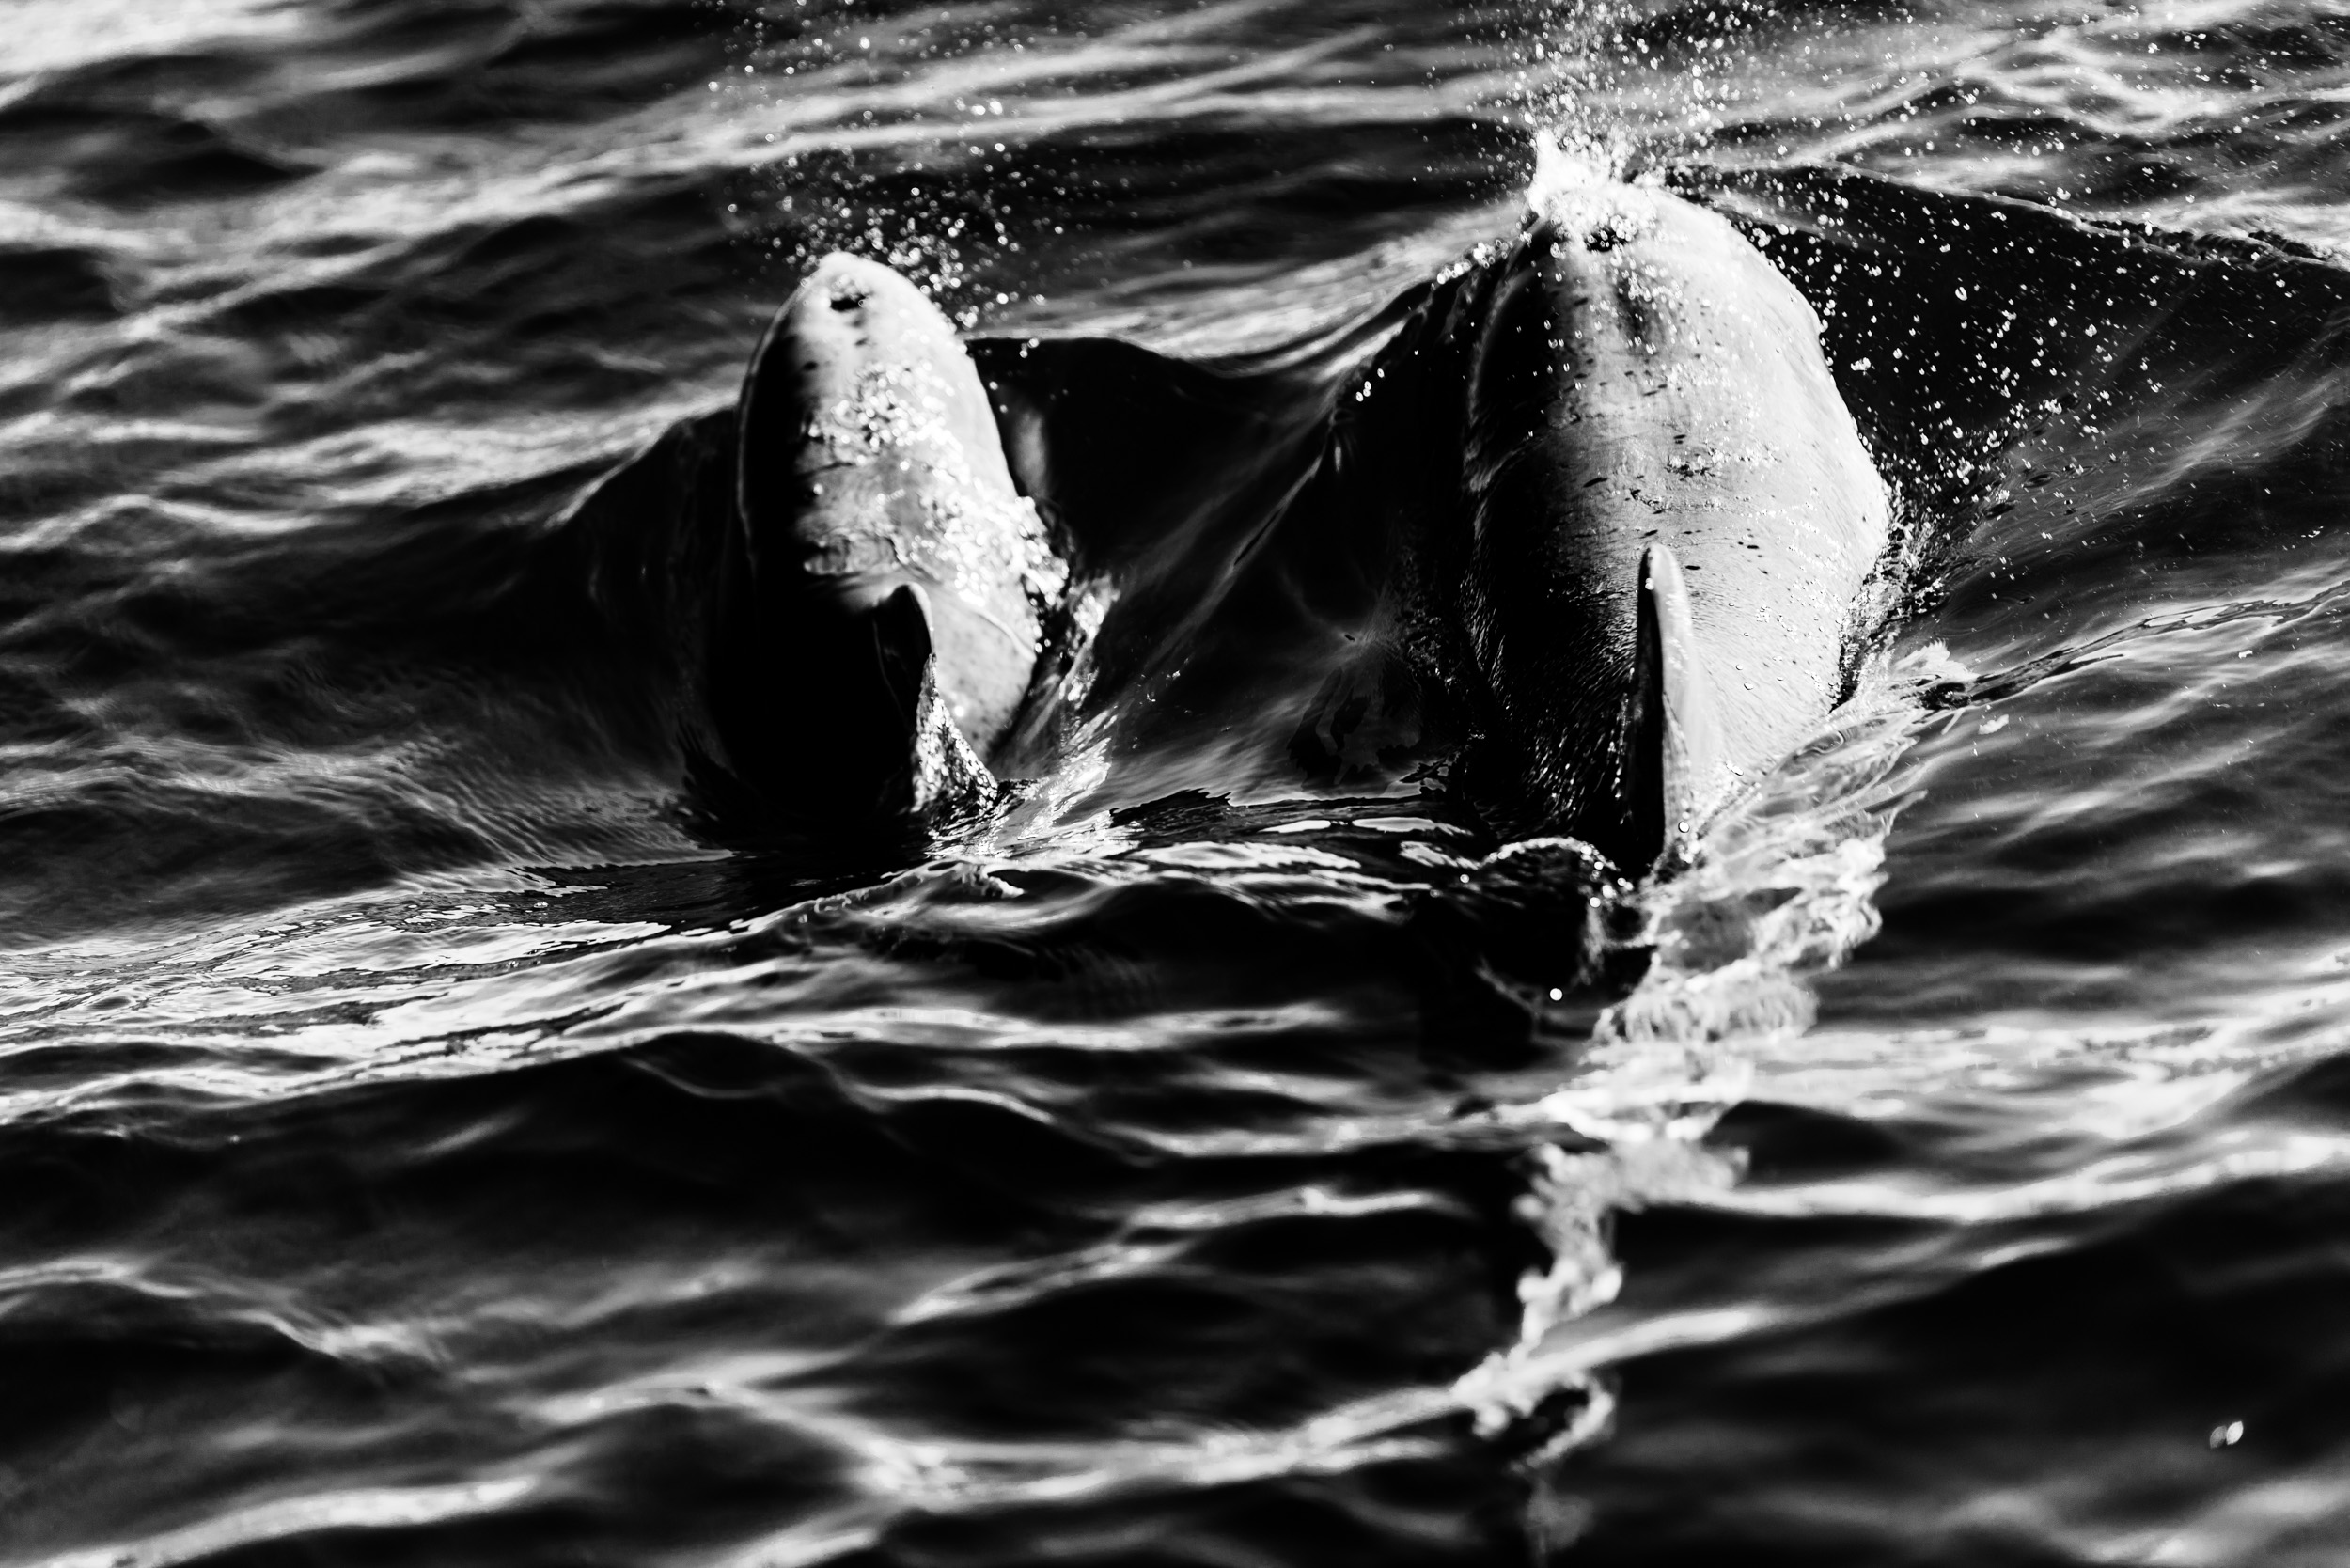 Spyrides_Kyle_Dolphin_Swimming_Rockingham_DSC2750.jpg